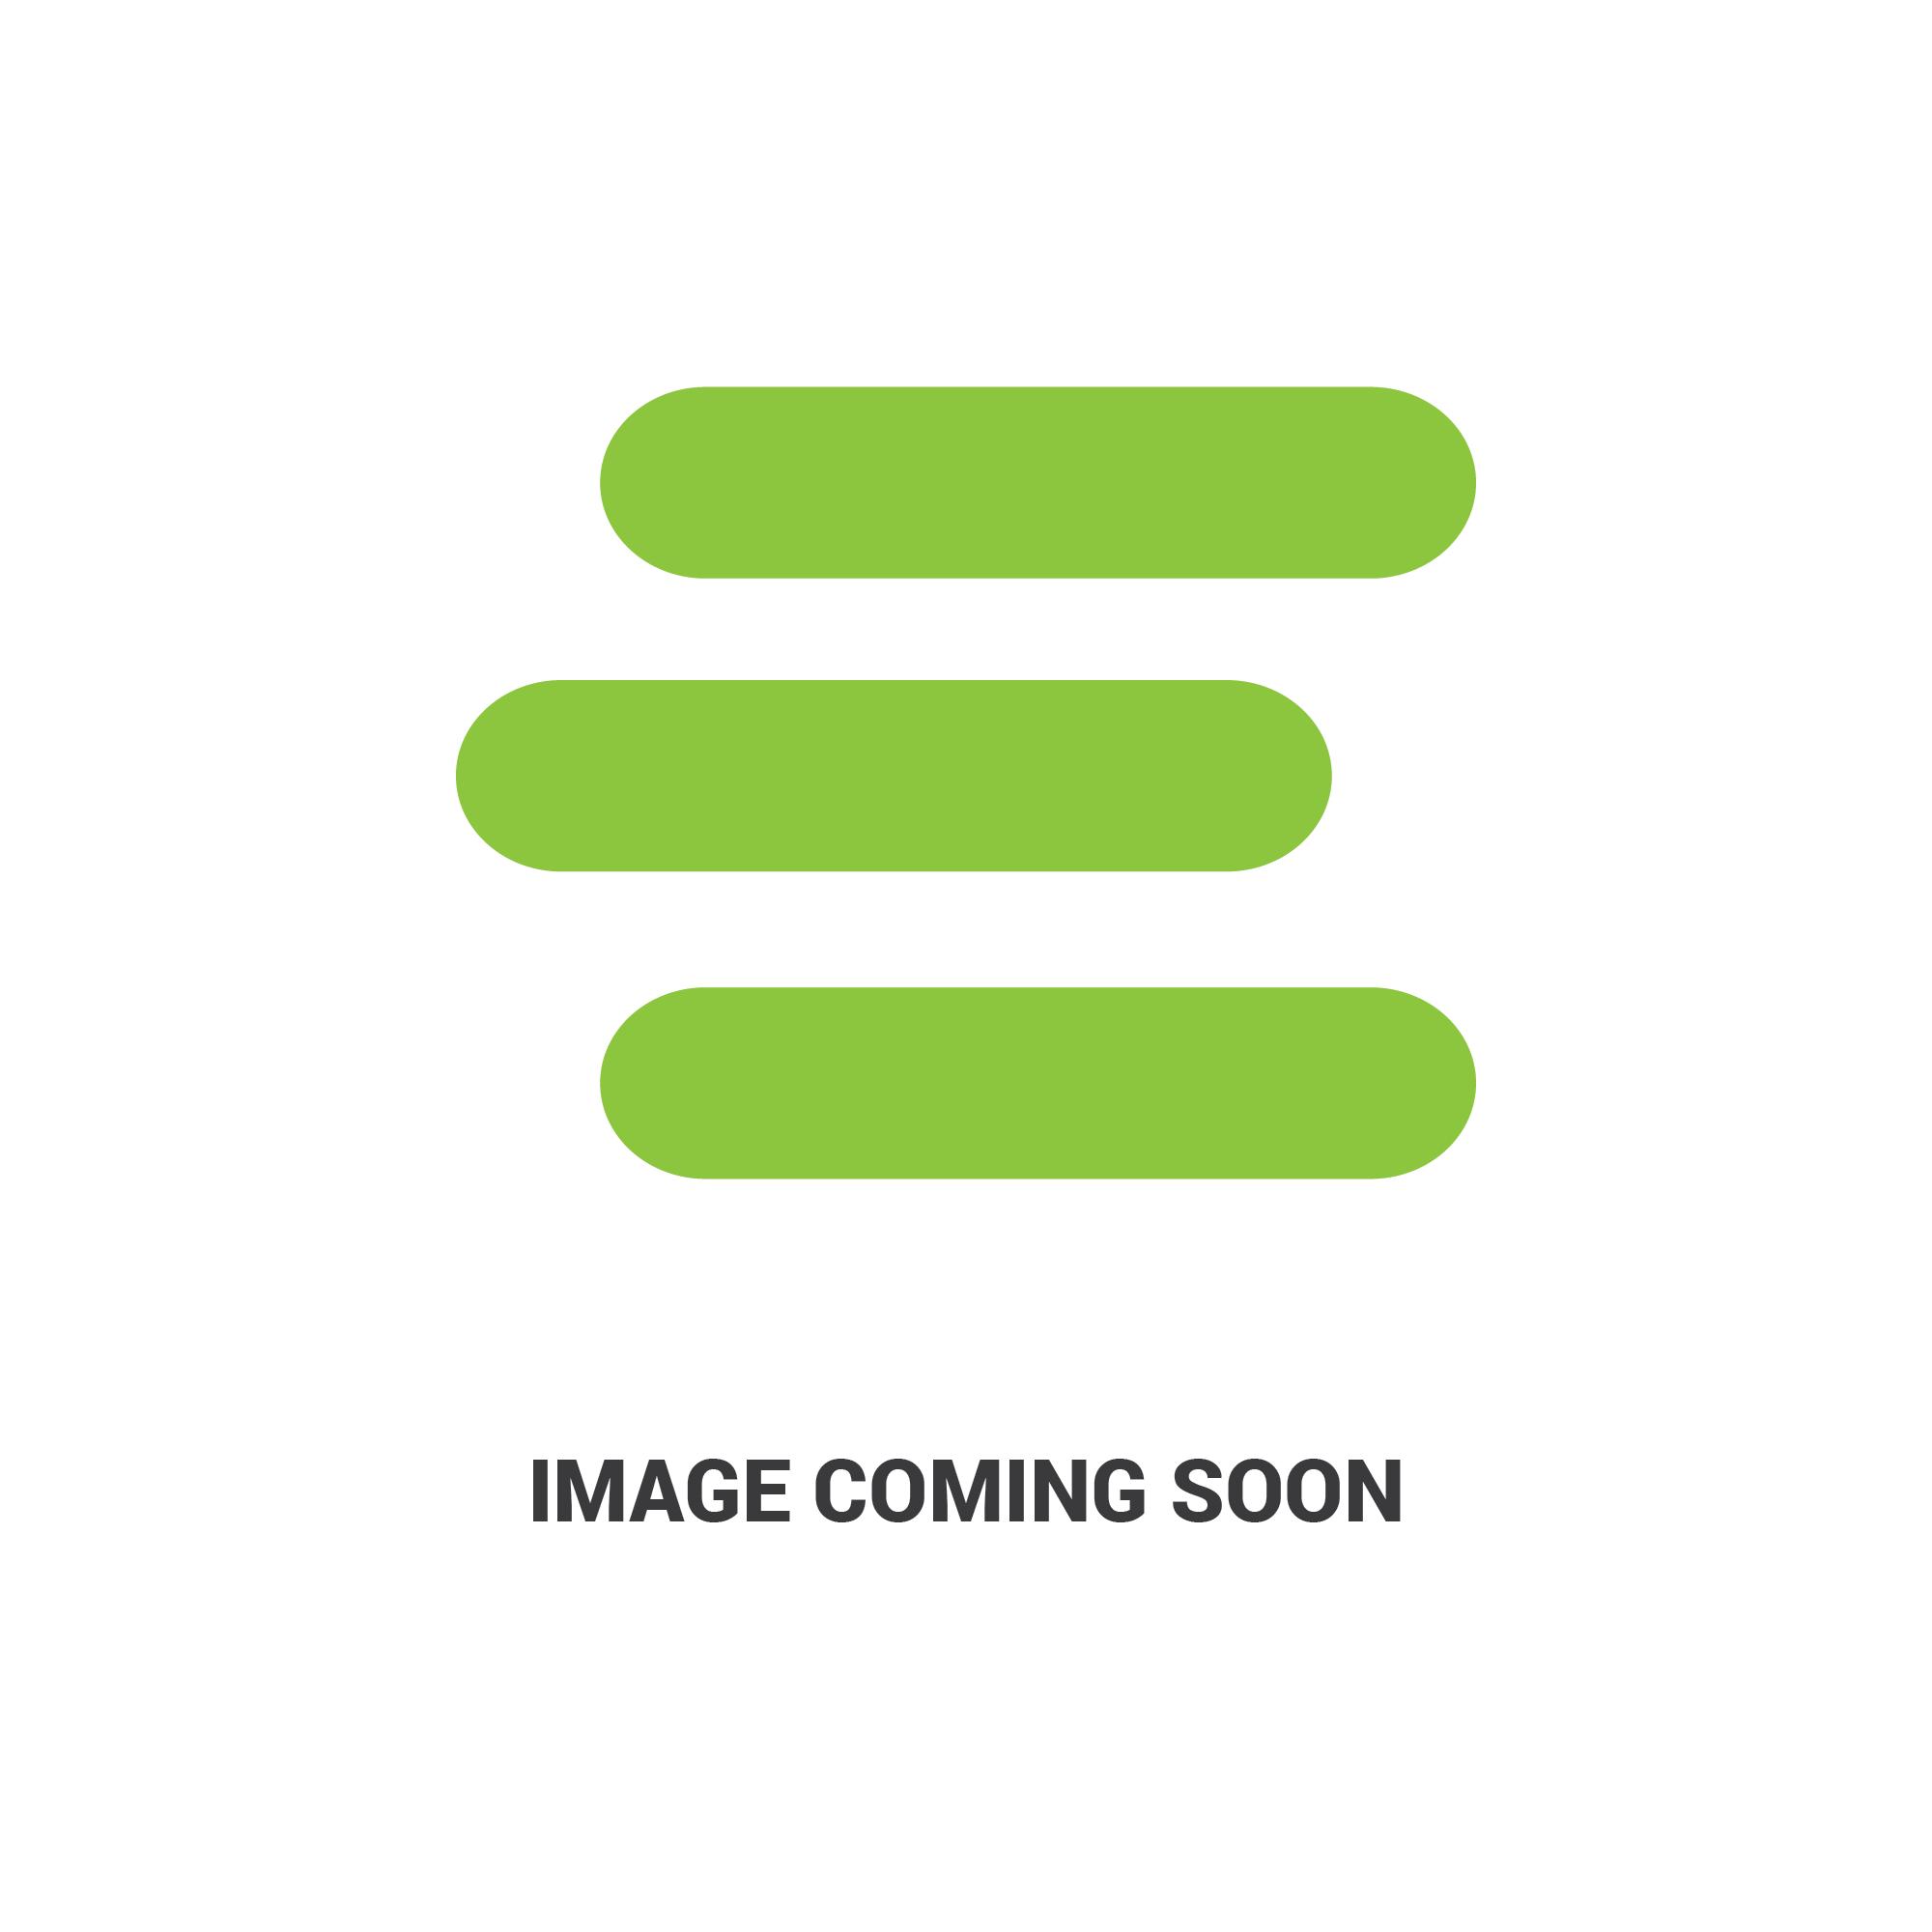 E-2685653-070edit 1215.jpg